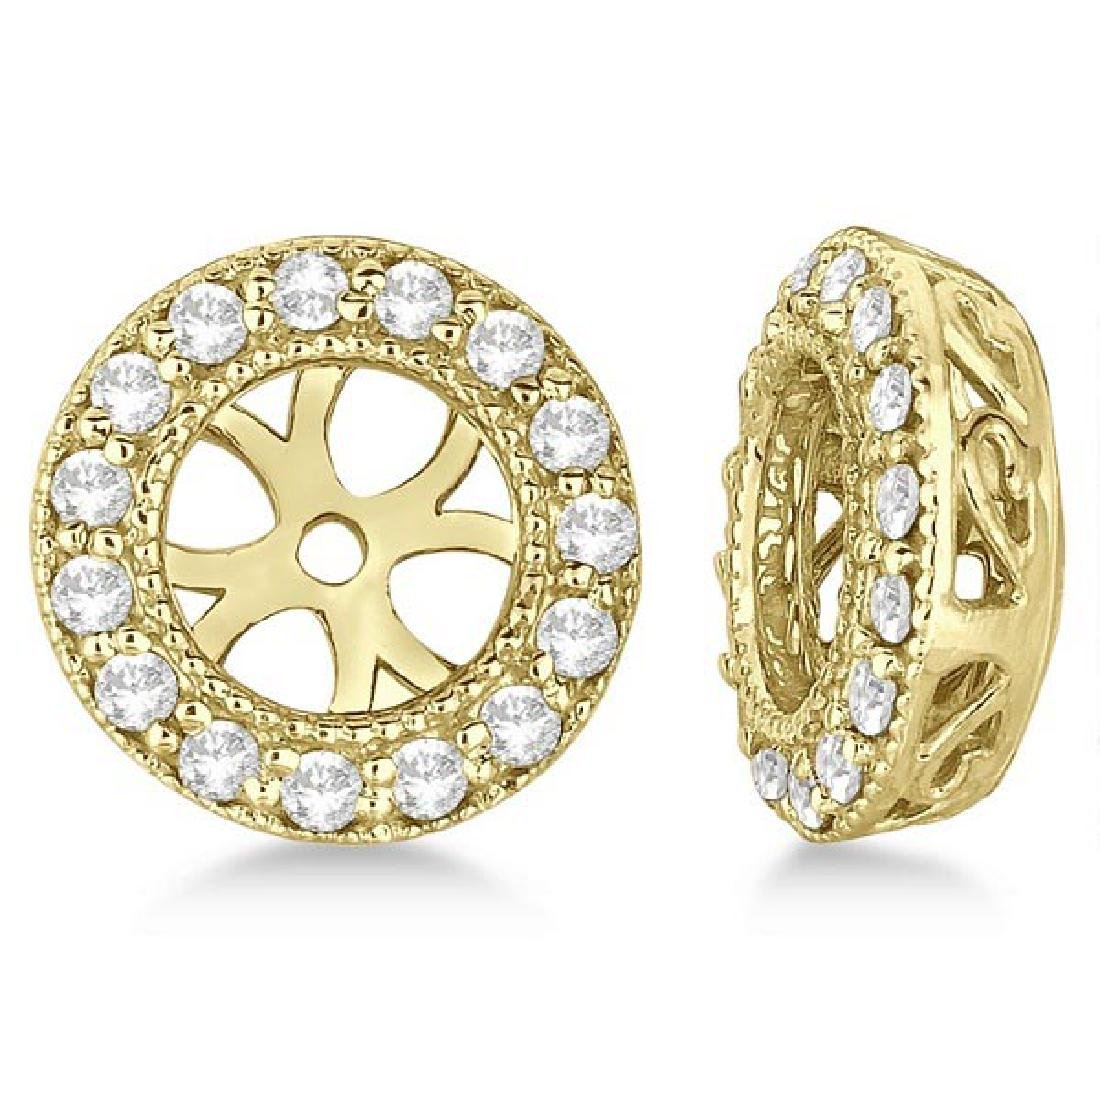 Vintage Round Cut Diamond Earring Jackets 14k Yellow Go